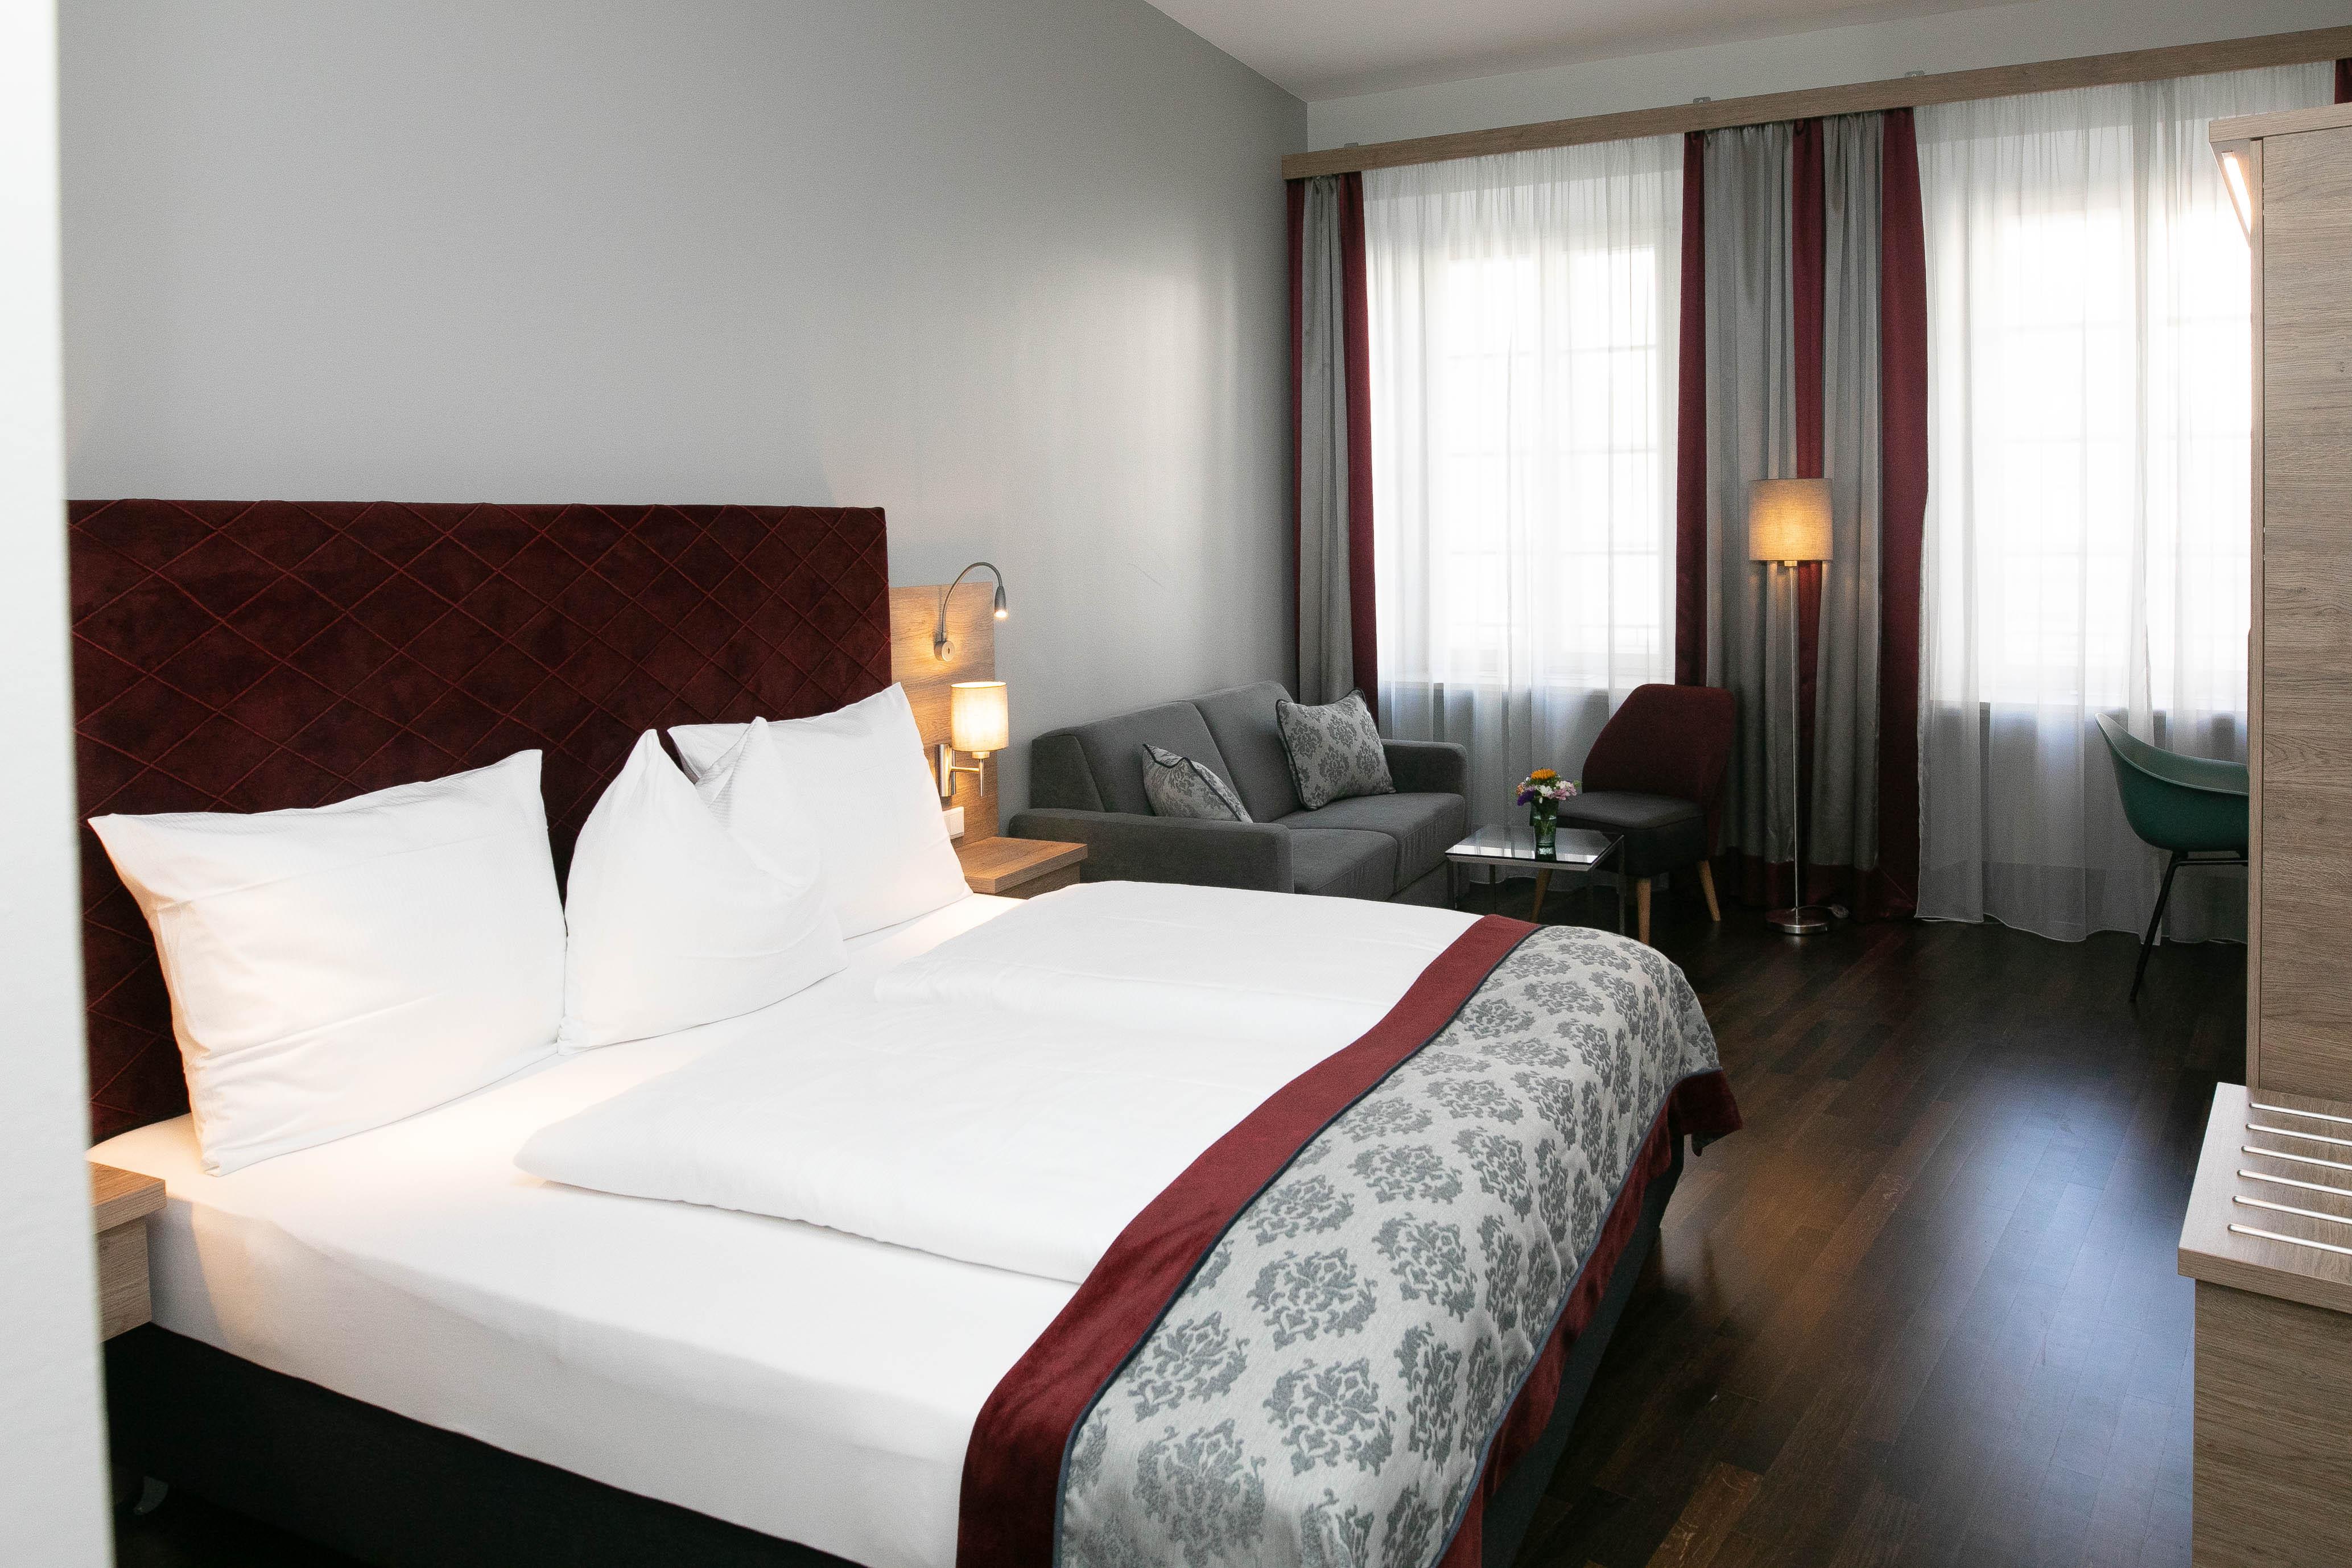 Hotel Elefant the family Business, Getreidegasse 1, Salzburg, ©www.wildbild.at